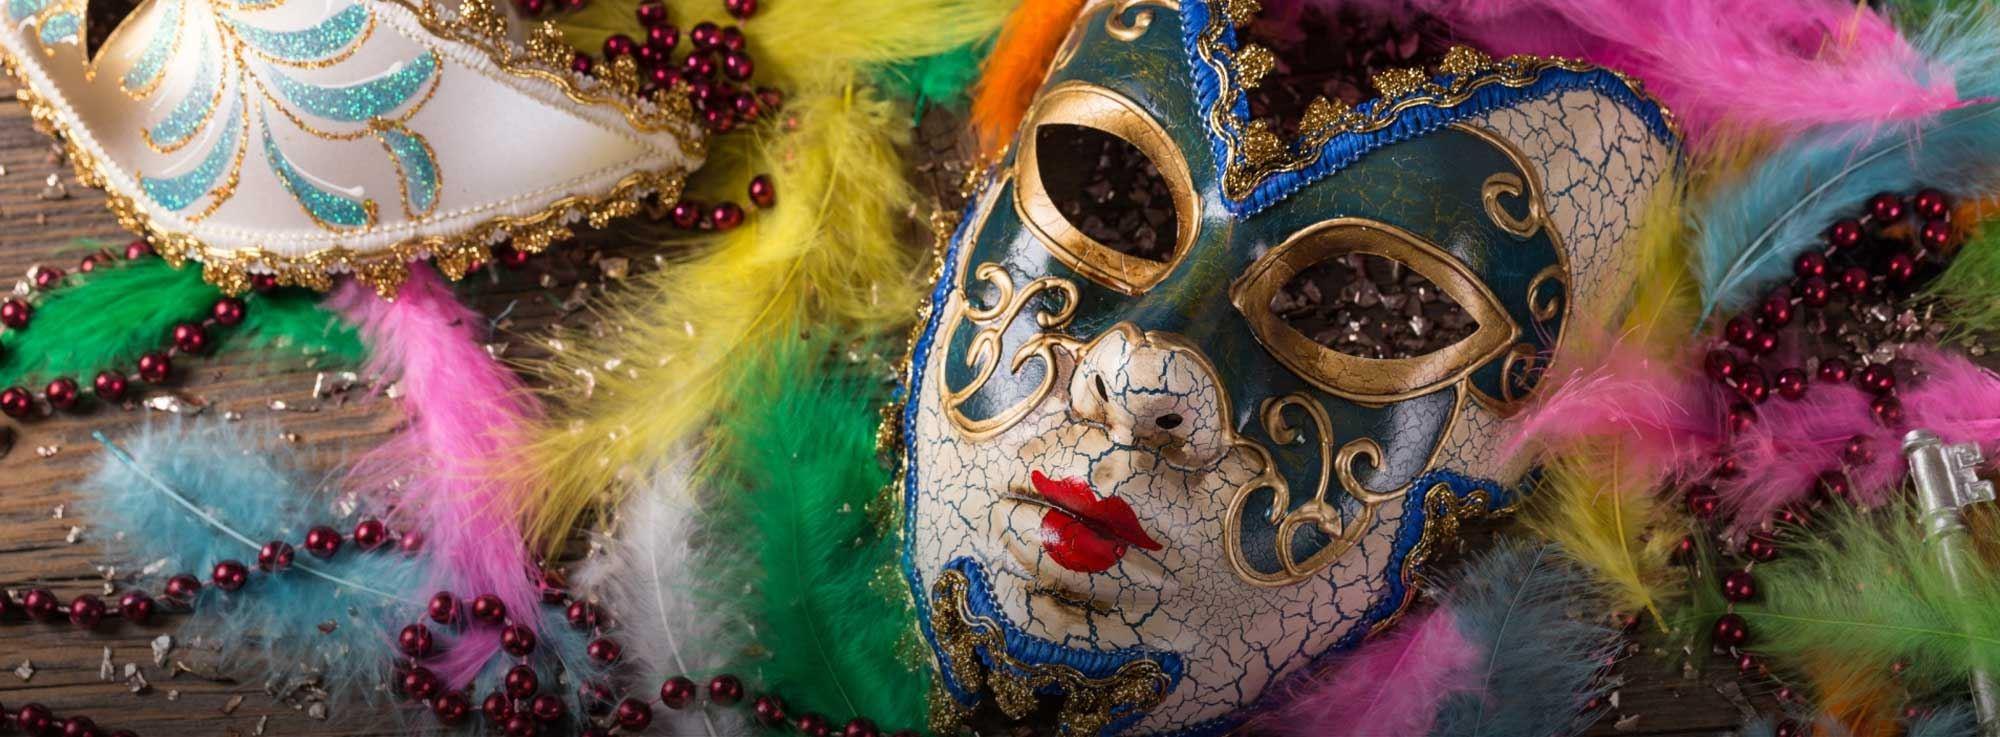 Taranto: U Carnevale de na vote